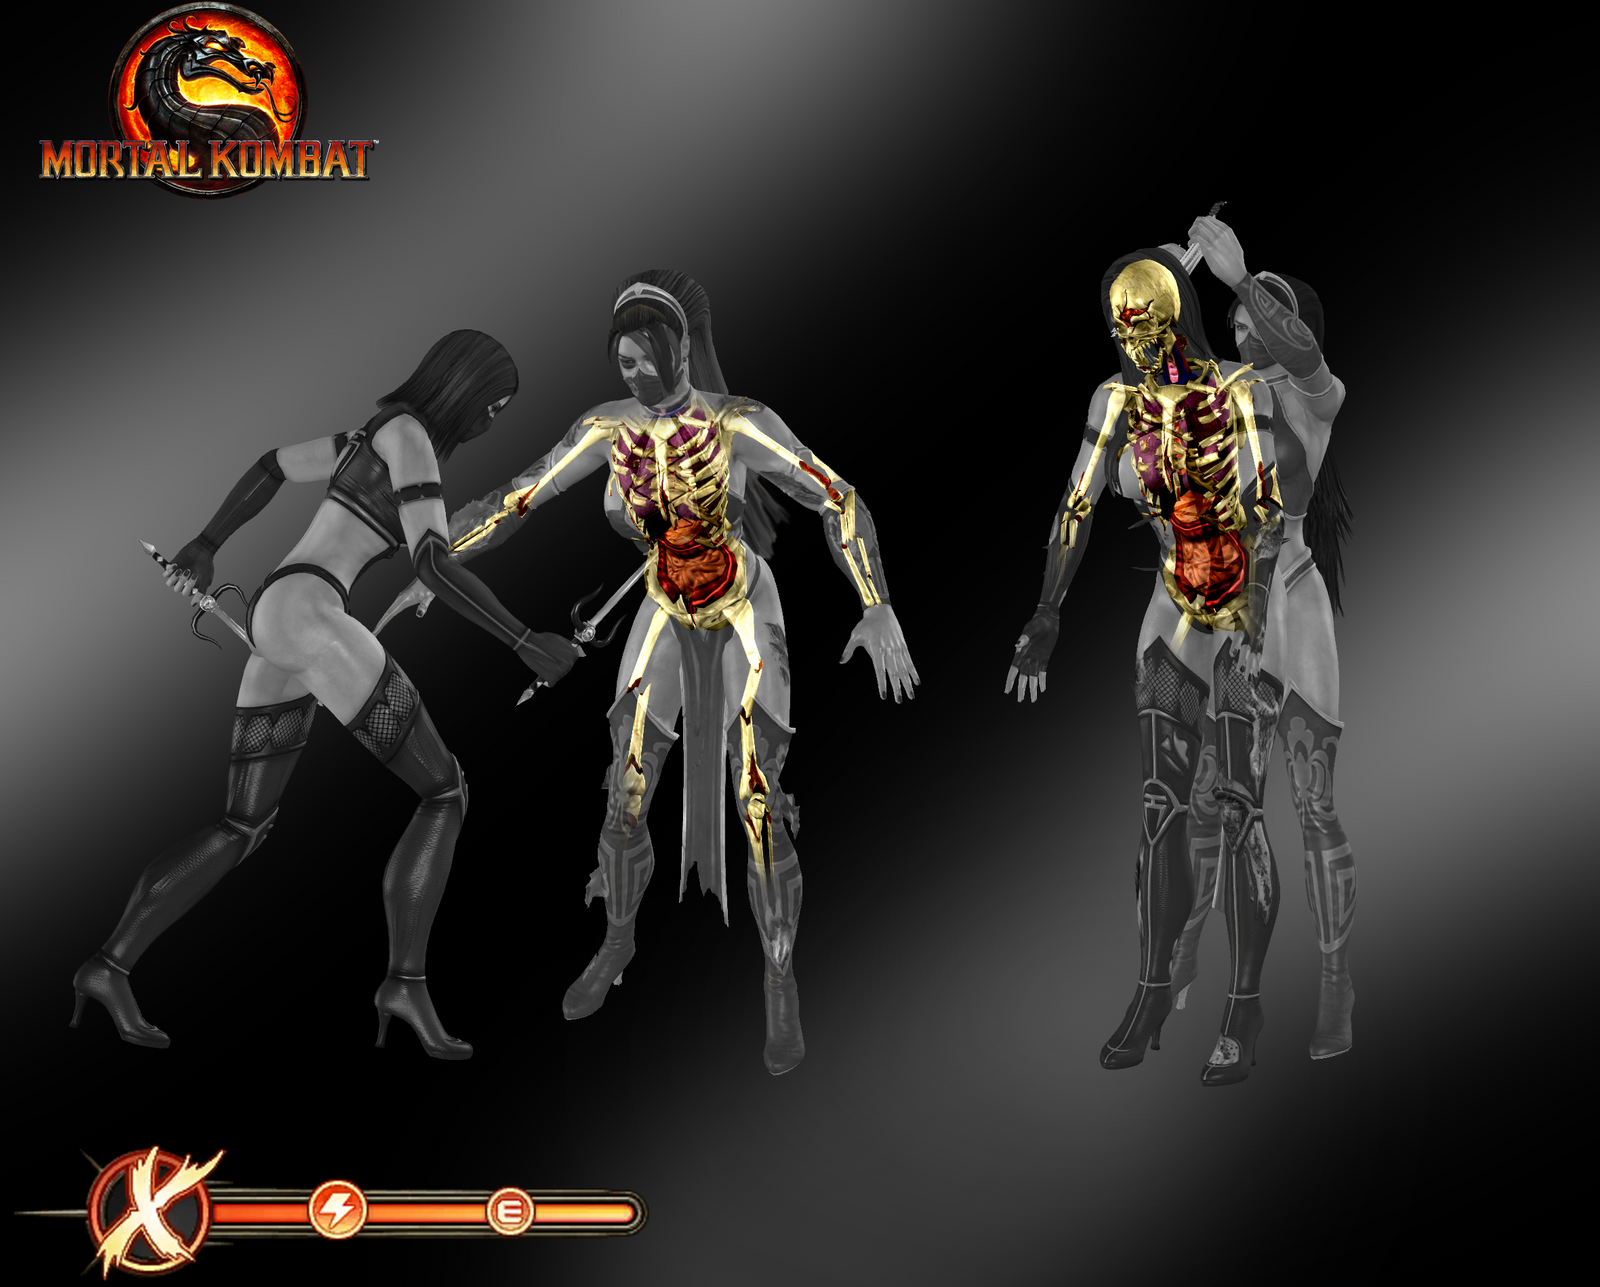 ... X-Ray Skeletons Pack 2 - Mortal Kombat 9 by romero1718